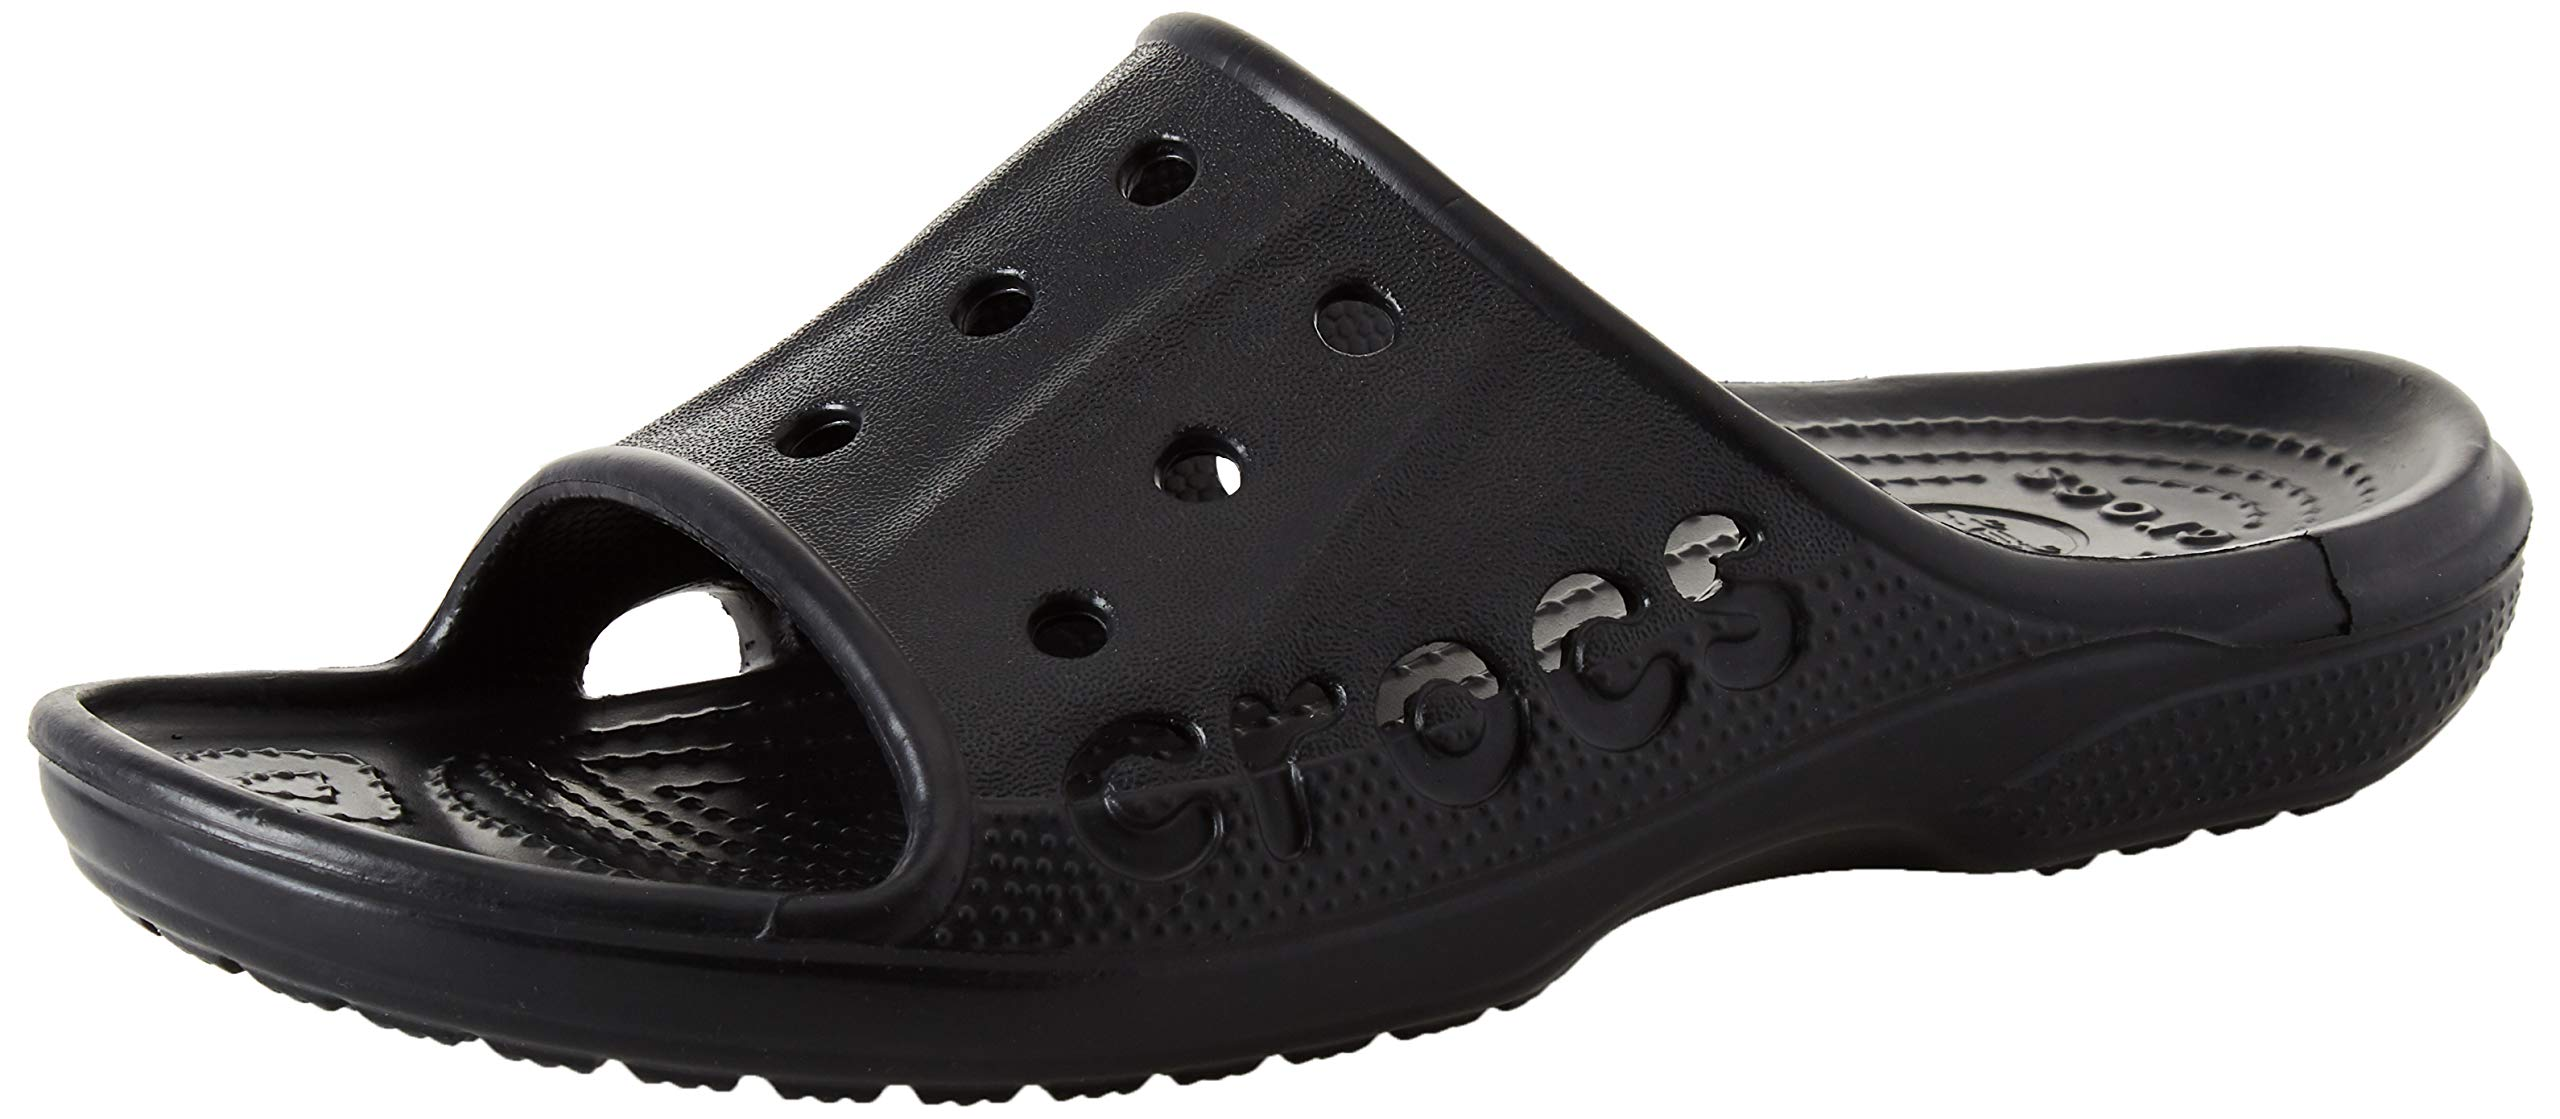 Crocs Unisex Baya Slide, Black, 10 M US Men / 12 M US Women